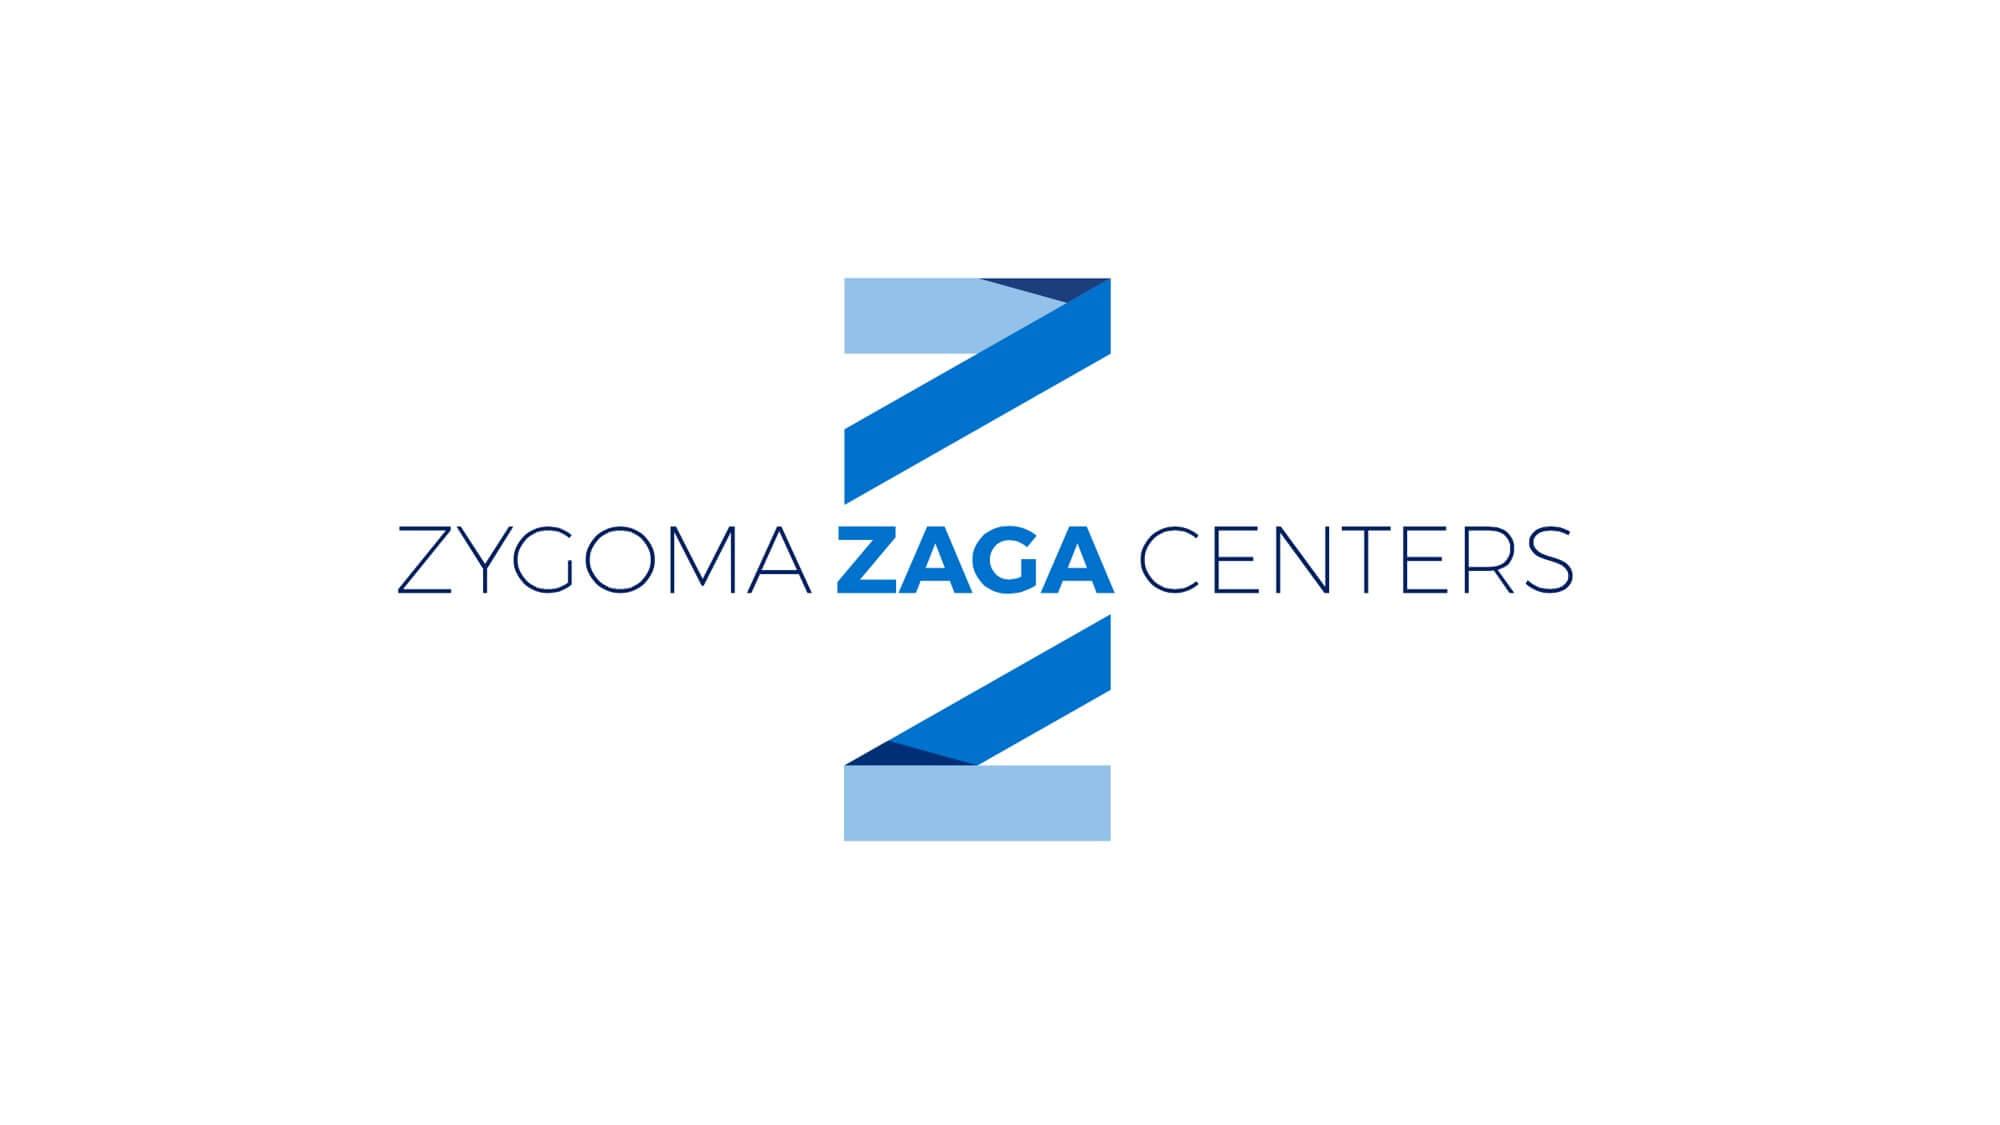 Logo Zygoma ZAGA Centers